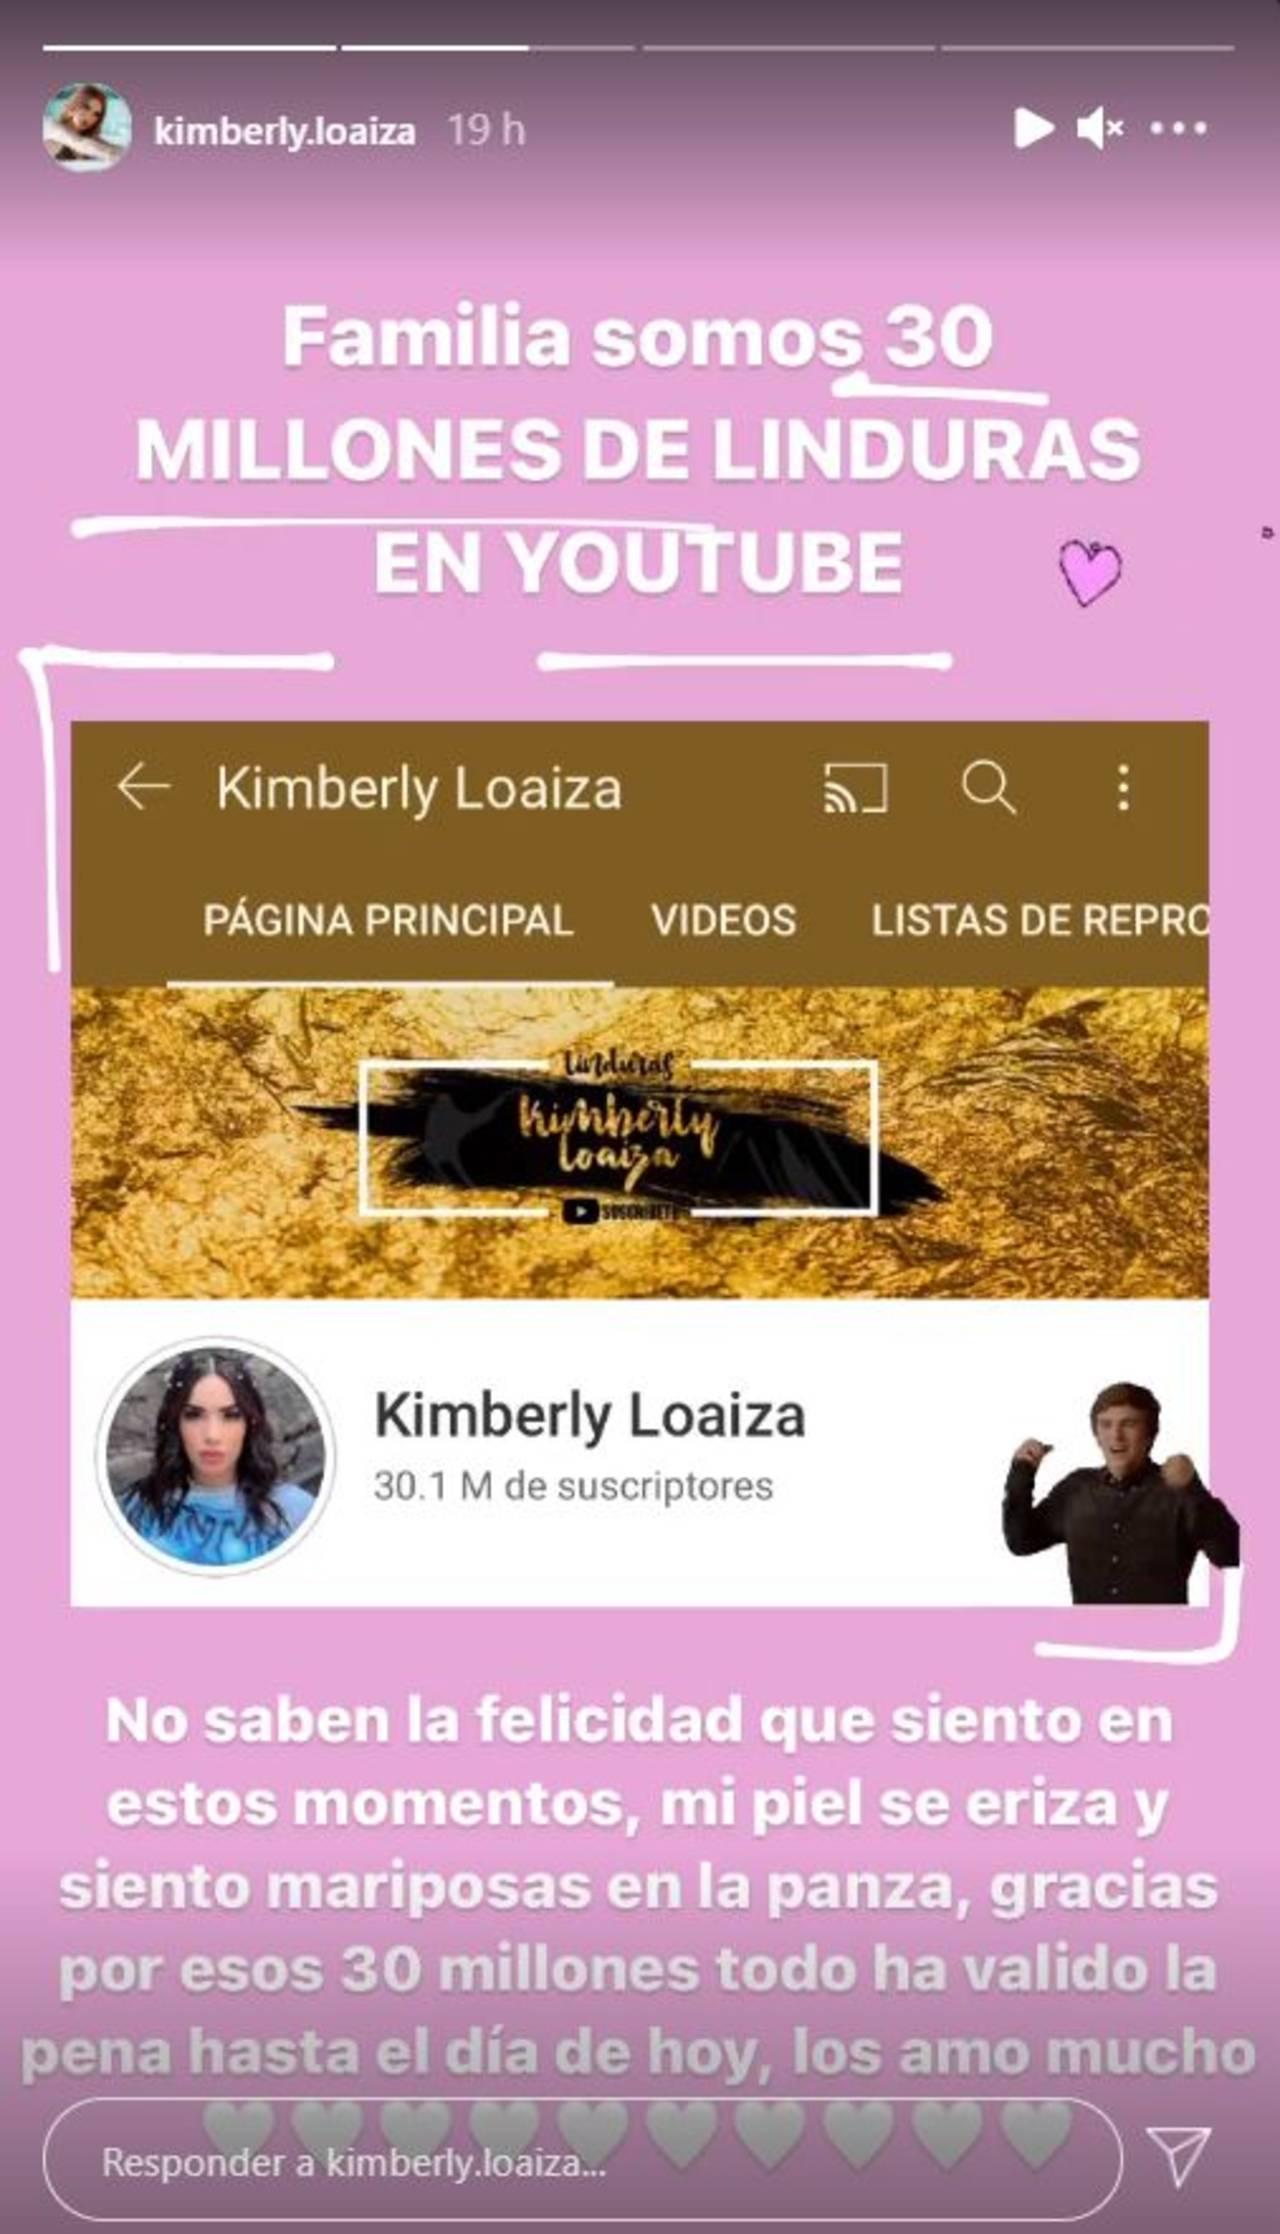 Kimberly Loaiza millones suscriptores YouTube